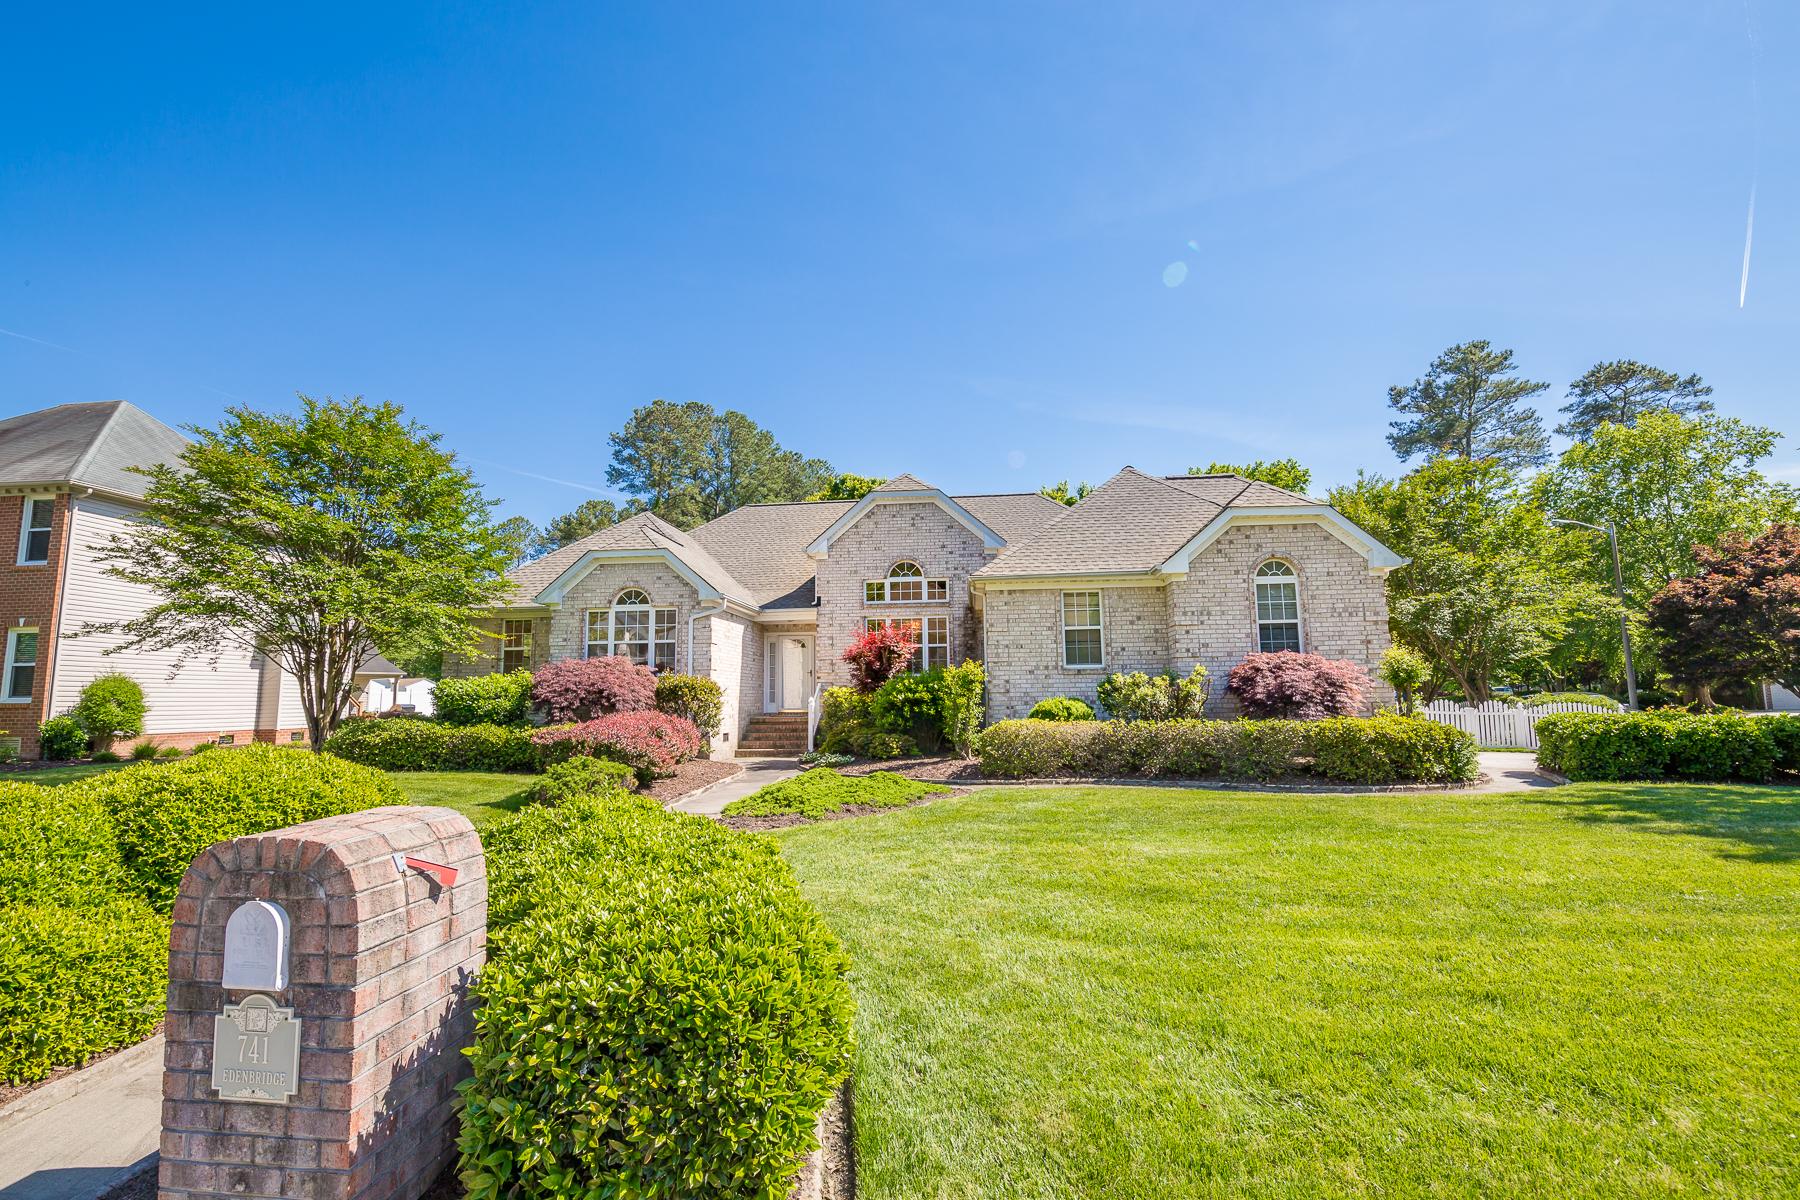 Single Family Home for Sale at The Lakes of Etheridge 741 Edenbridge Drive Chesapeake, Virginia 23322 United States